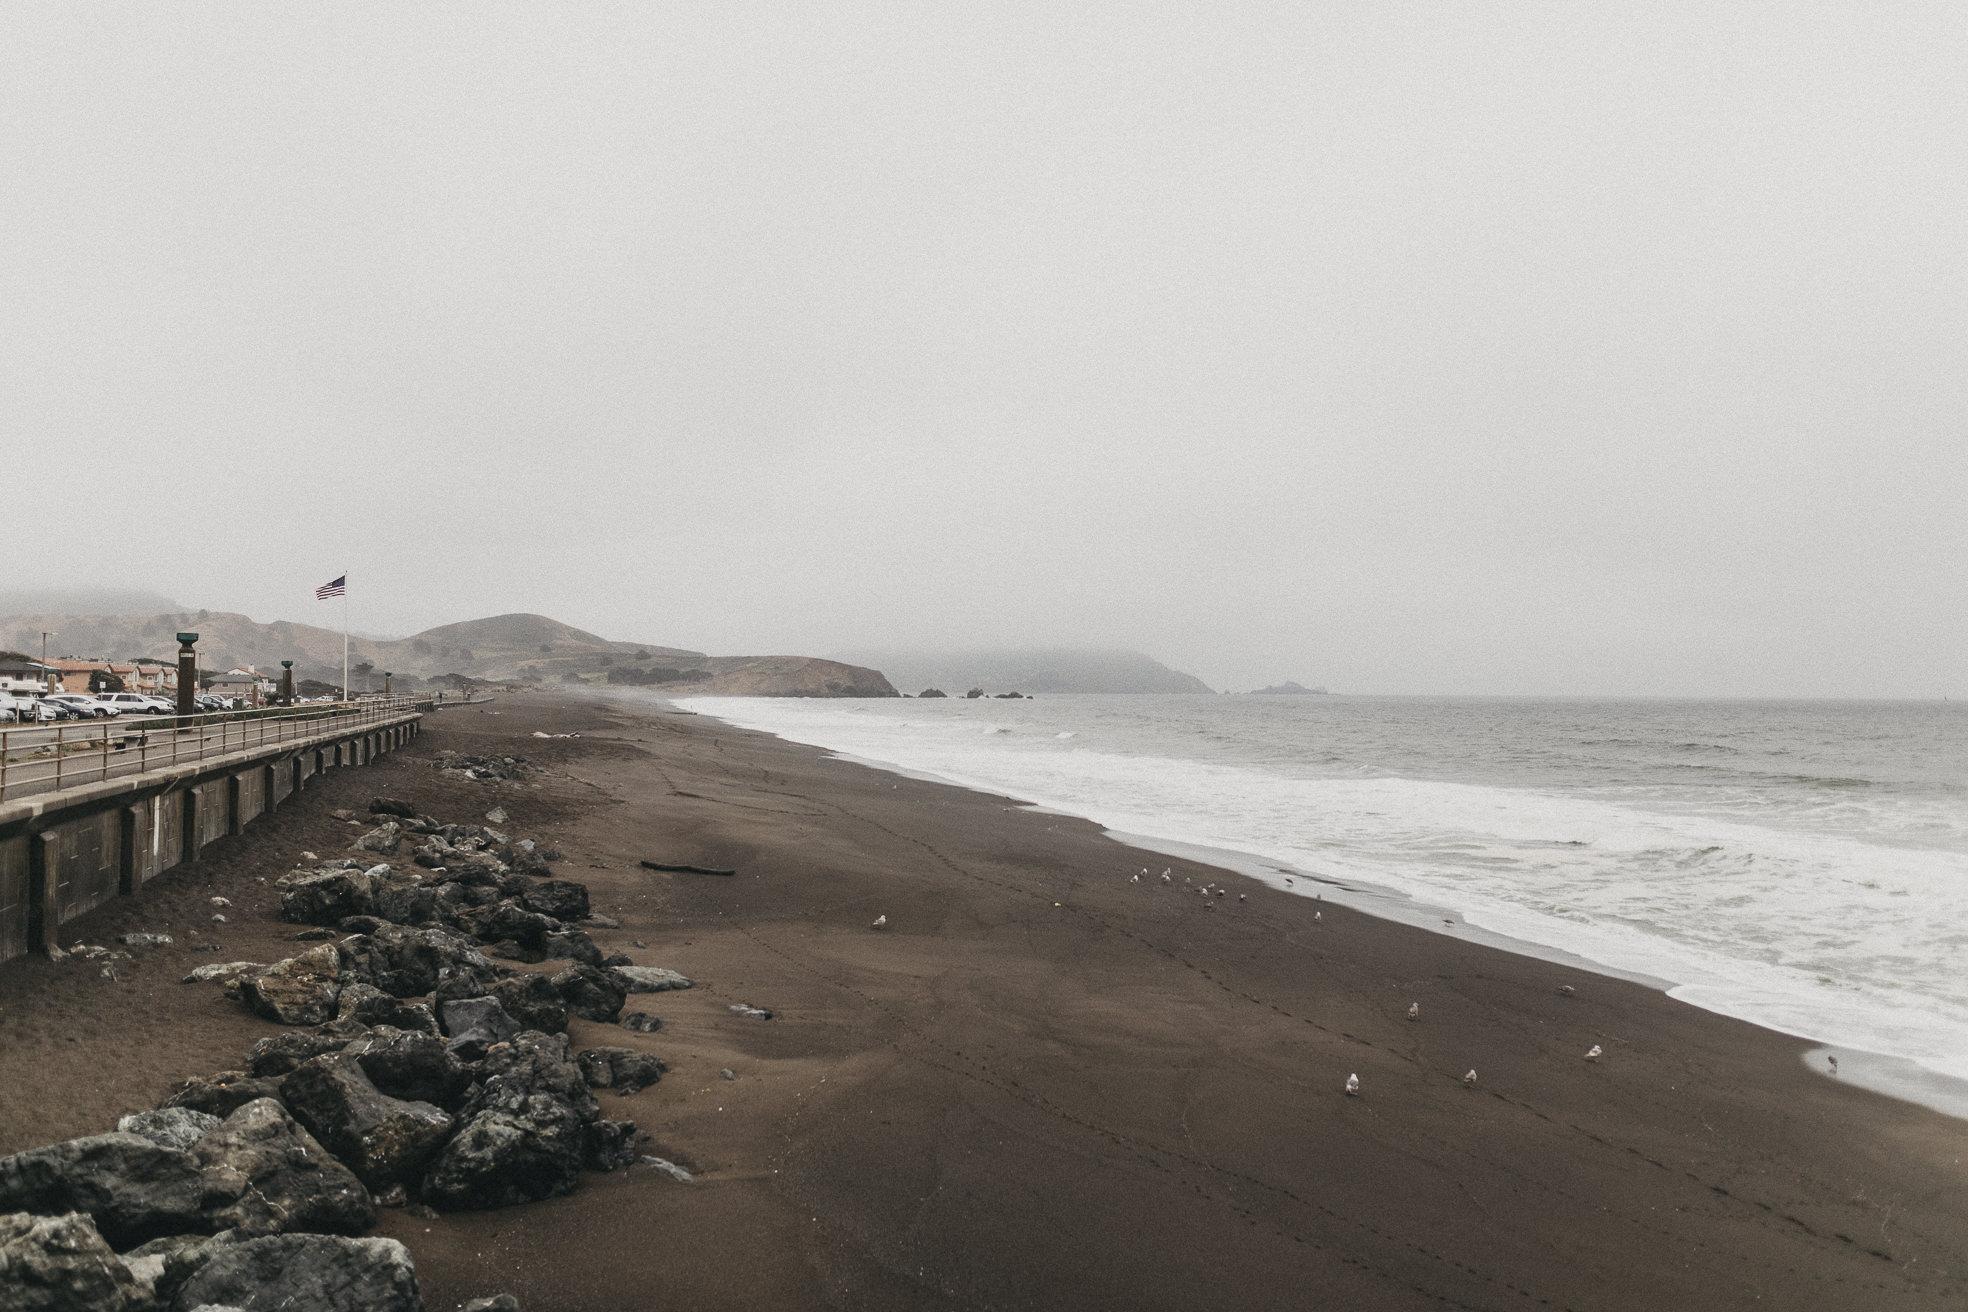 San-Francisco-BildervomLeben-9818